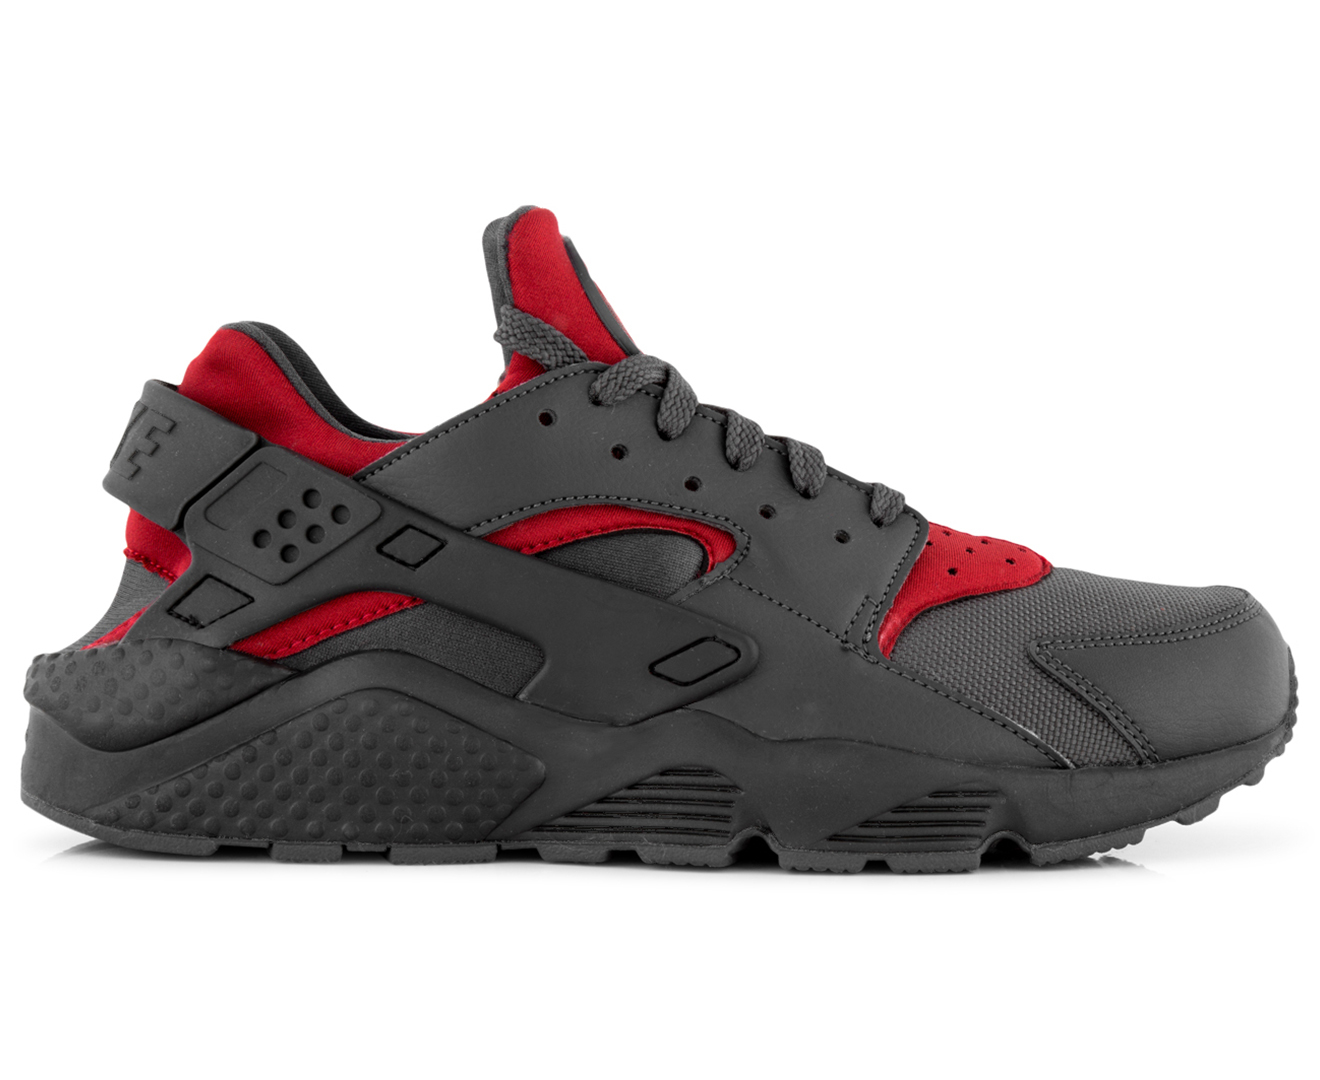 new product 8f8d4 99b3b Nike Men s Air Huarache Shoe - Gym Red Gym Red-Black   Catch.com.au